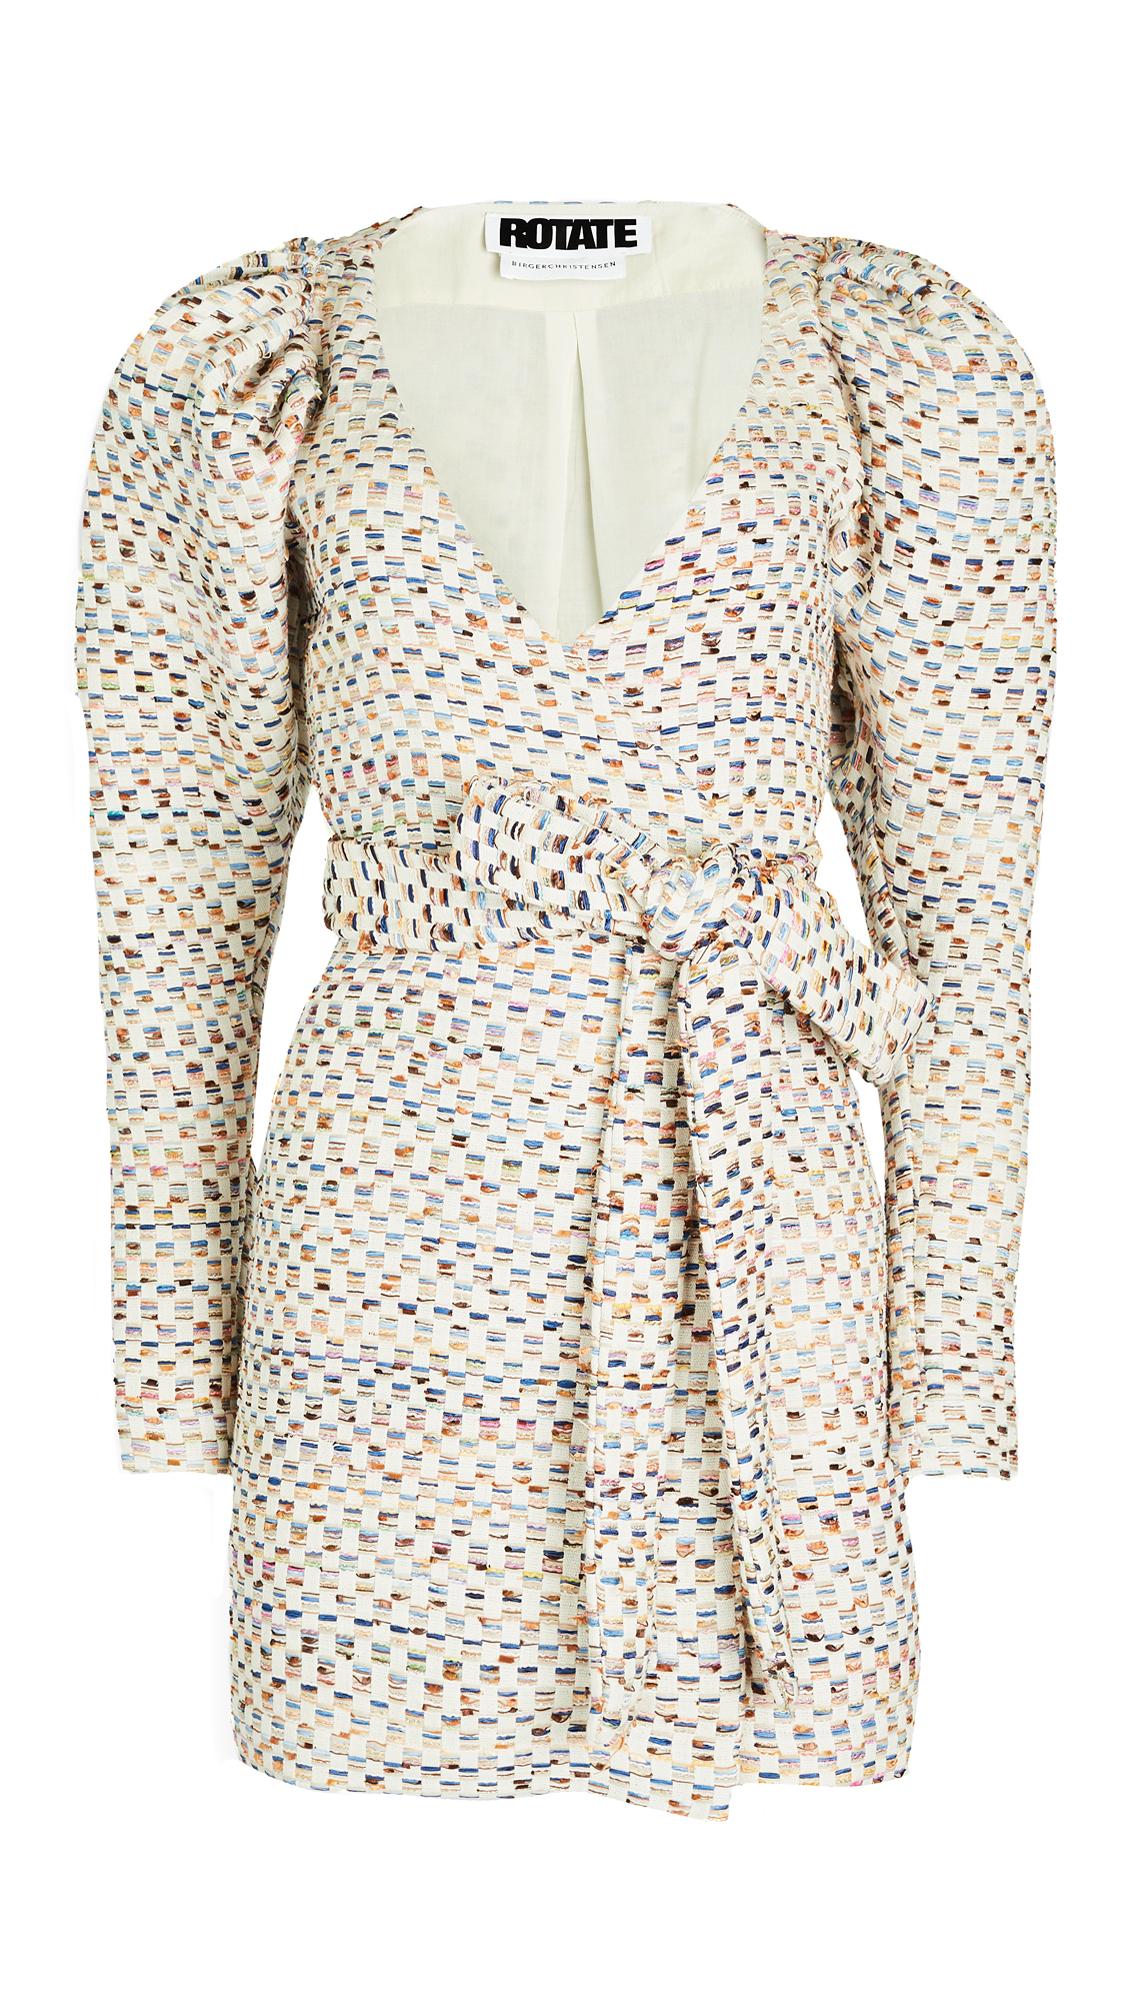 ROTATE Bridget Dress